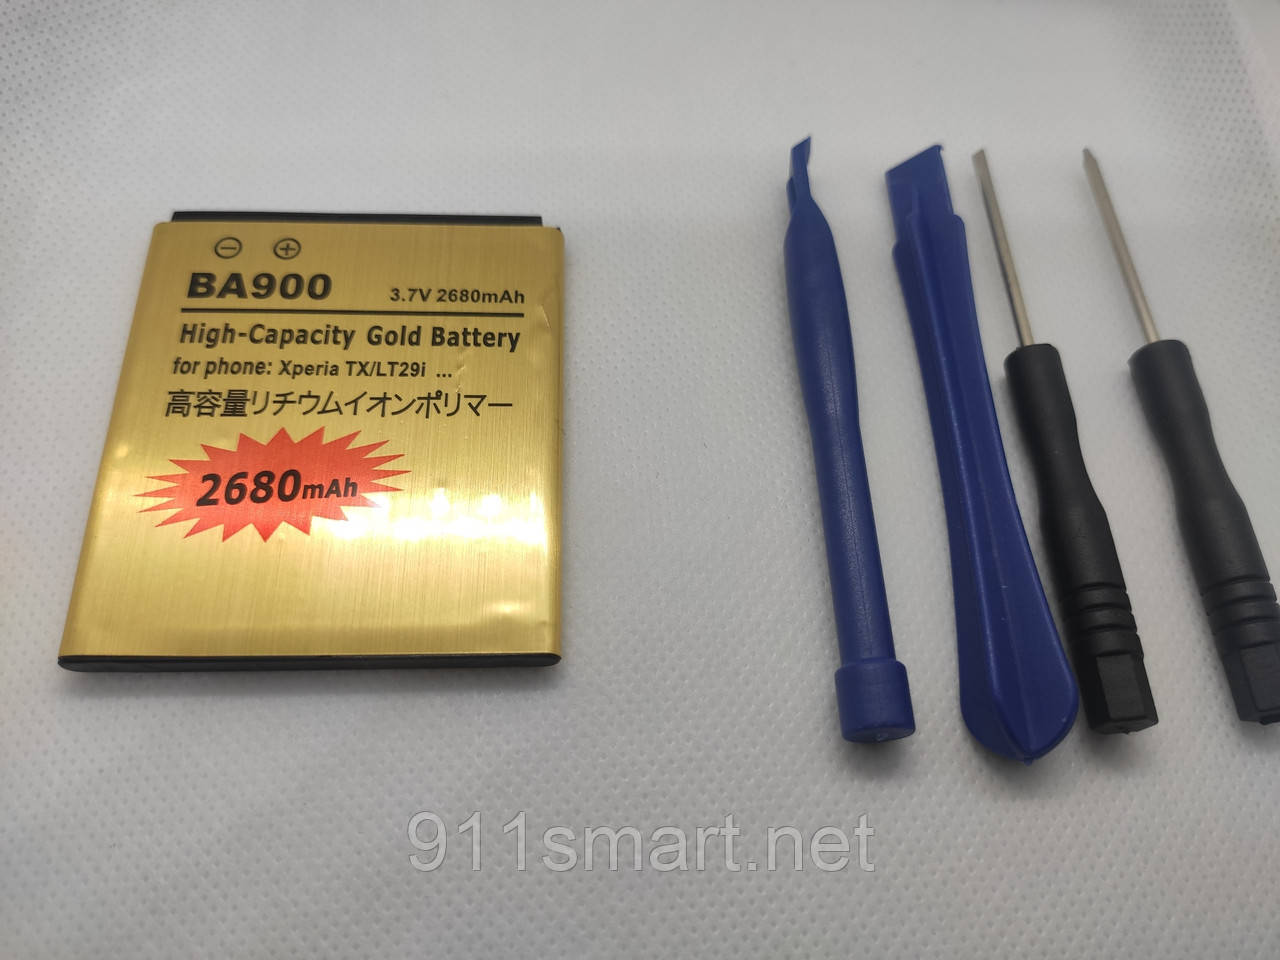 Аккумулятор BA900 Sony Xperia TX / LT29i / ST26